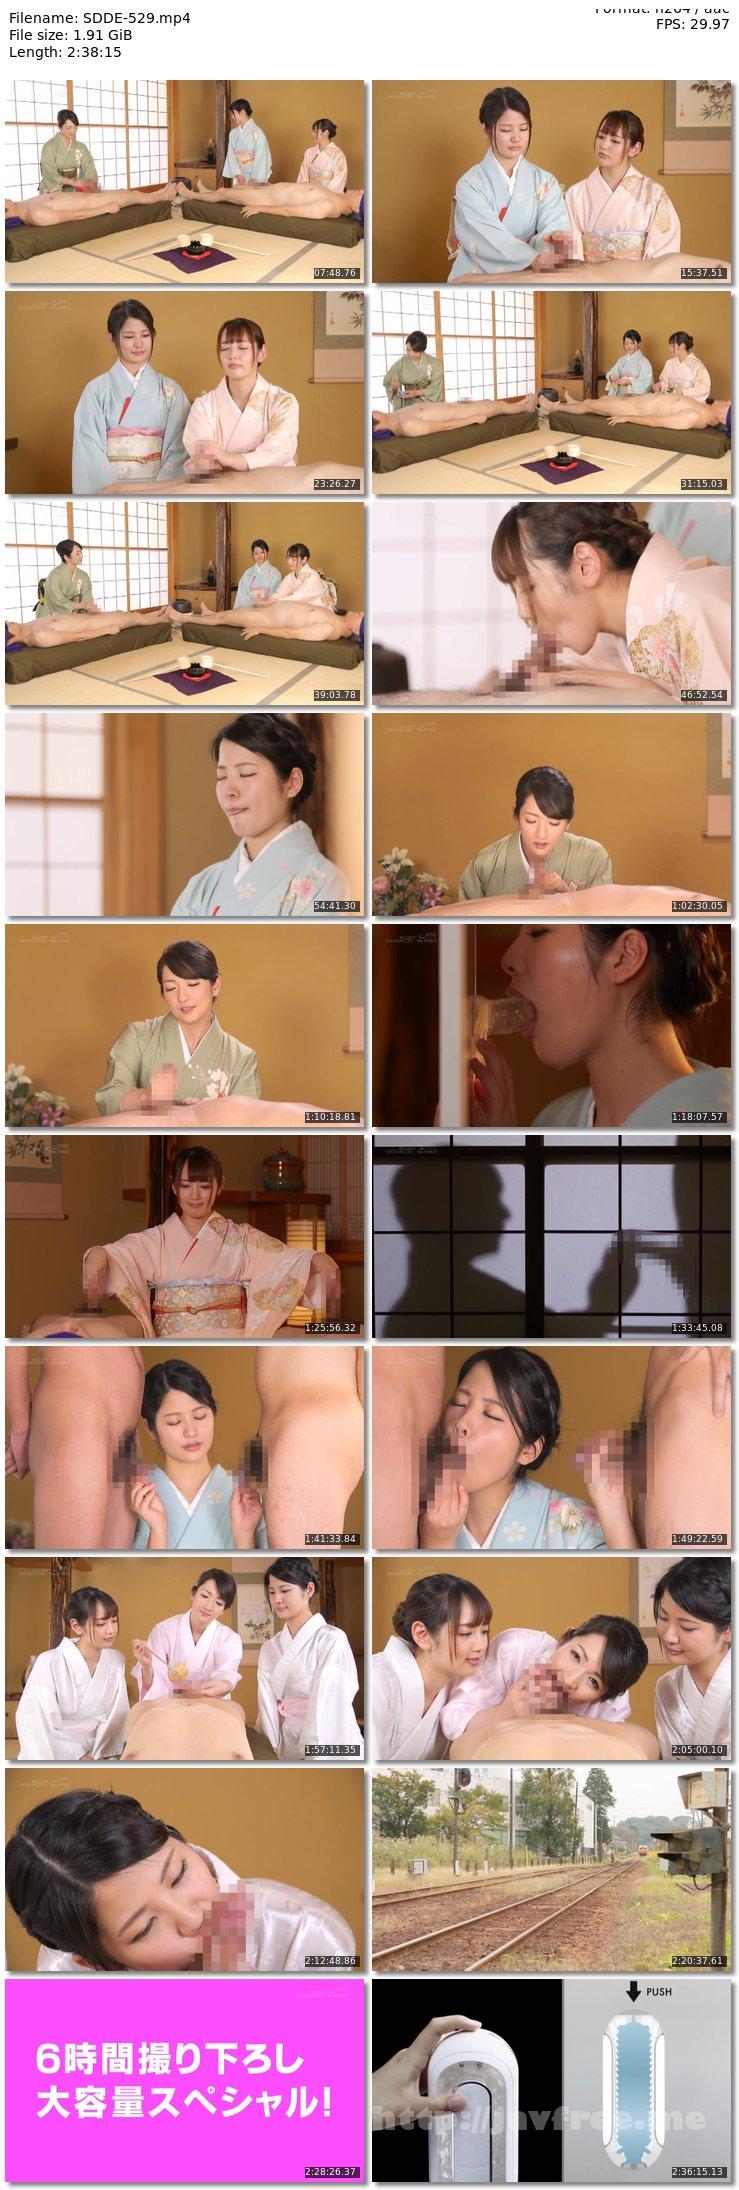 [HD][ZNN-001] 強姦記録。OL3名の膣内暴行中出し映像110分。 - image SDDE-529 on http://javcc.com